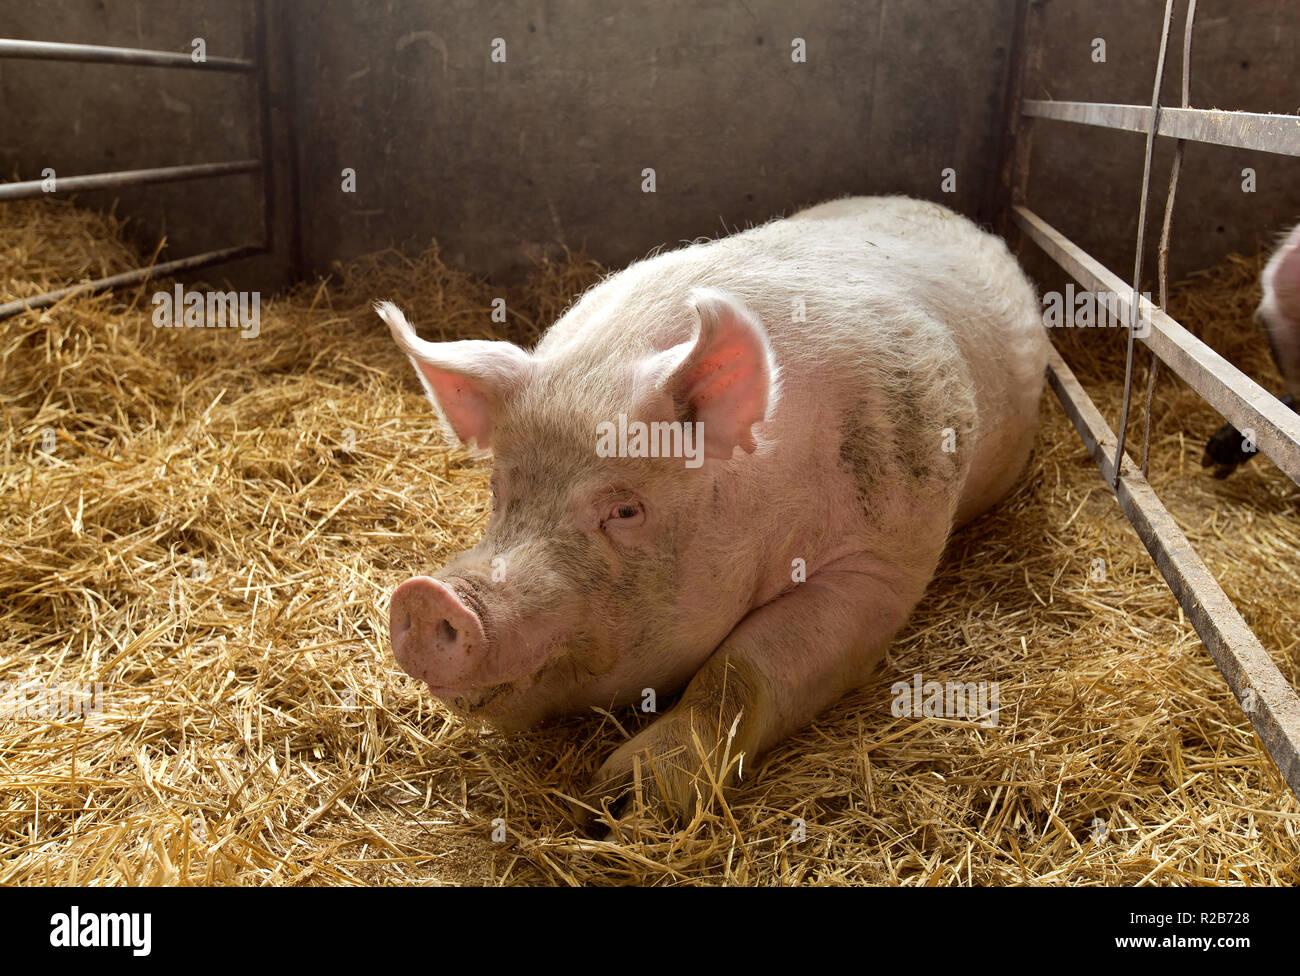 Wildschwein in Komfort, Stroh gebettet uns Pen scrofa domesticus'. Stockbild